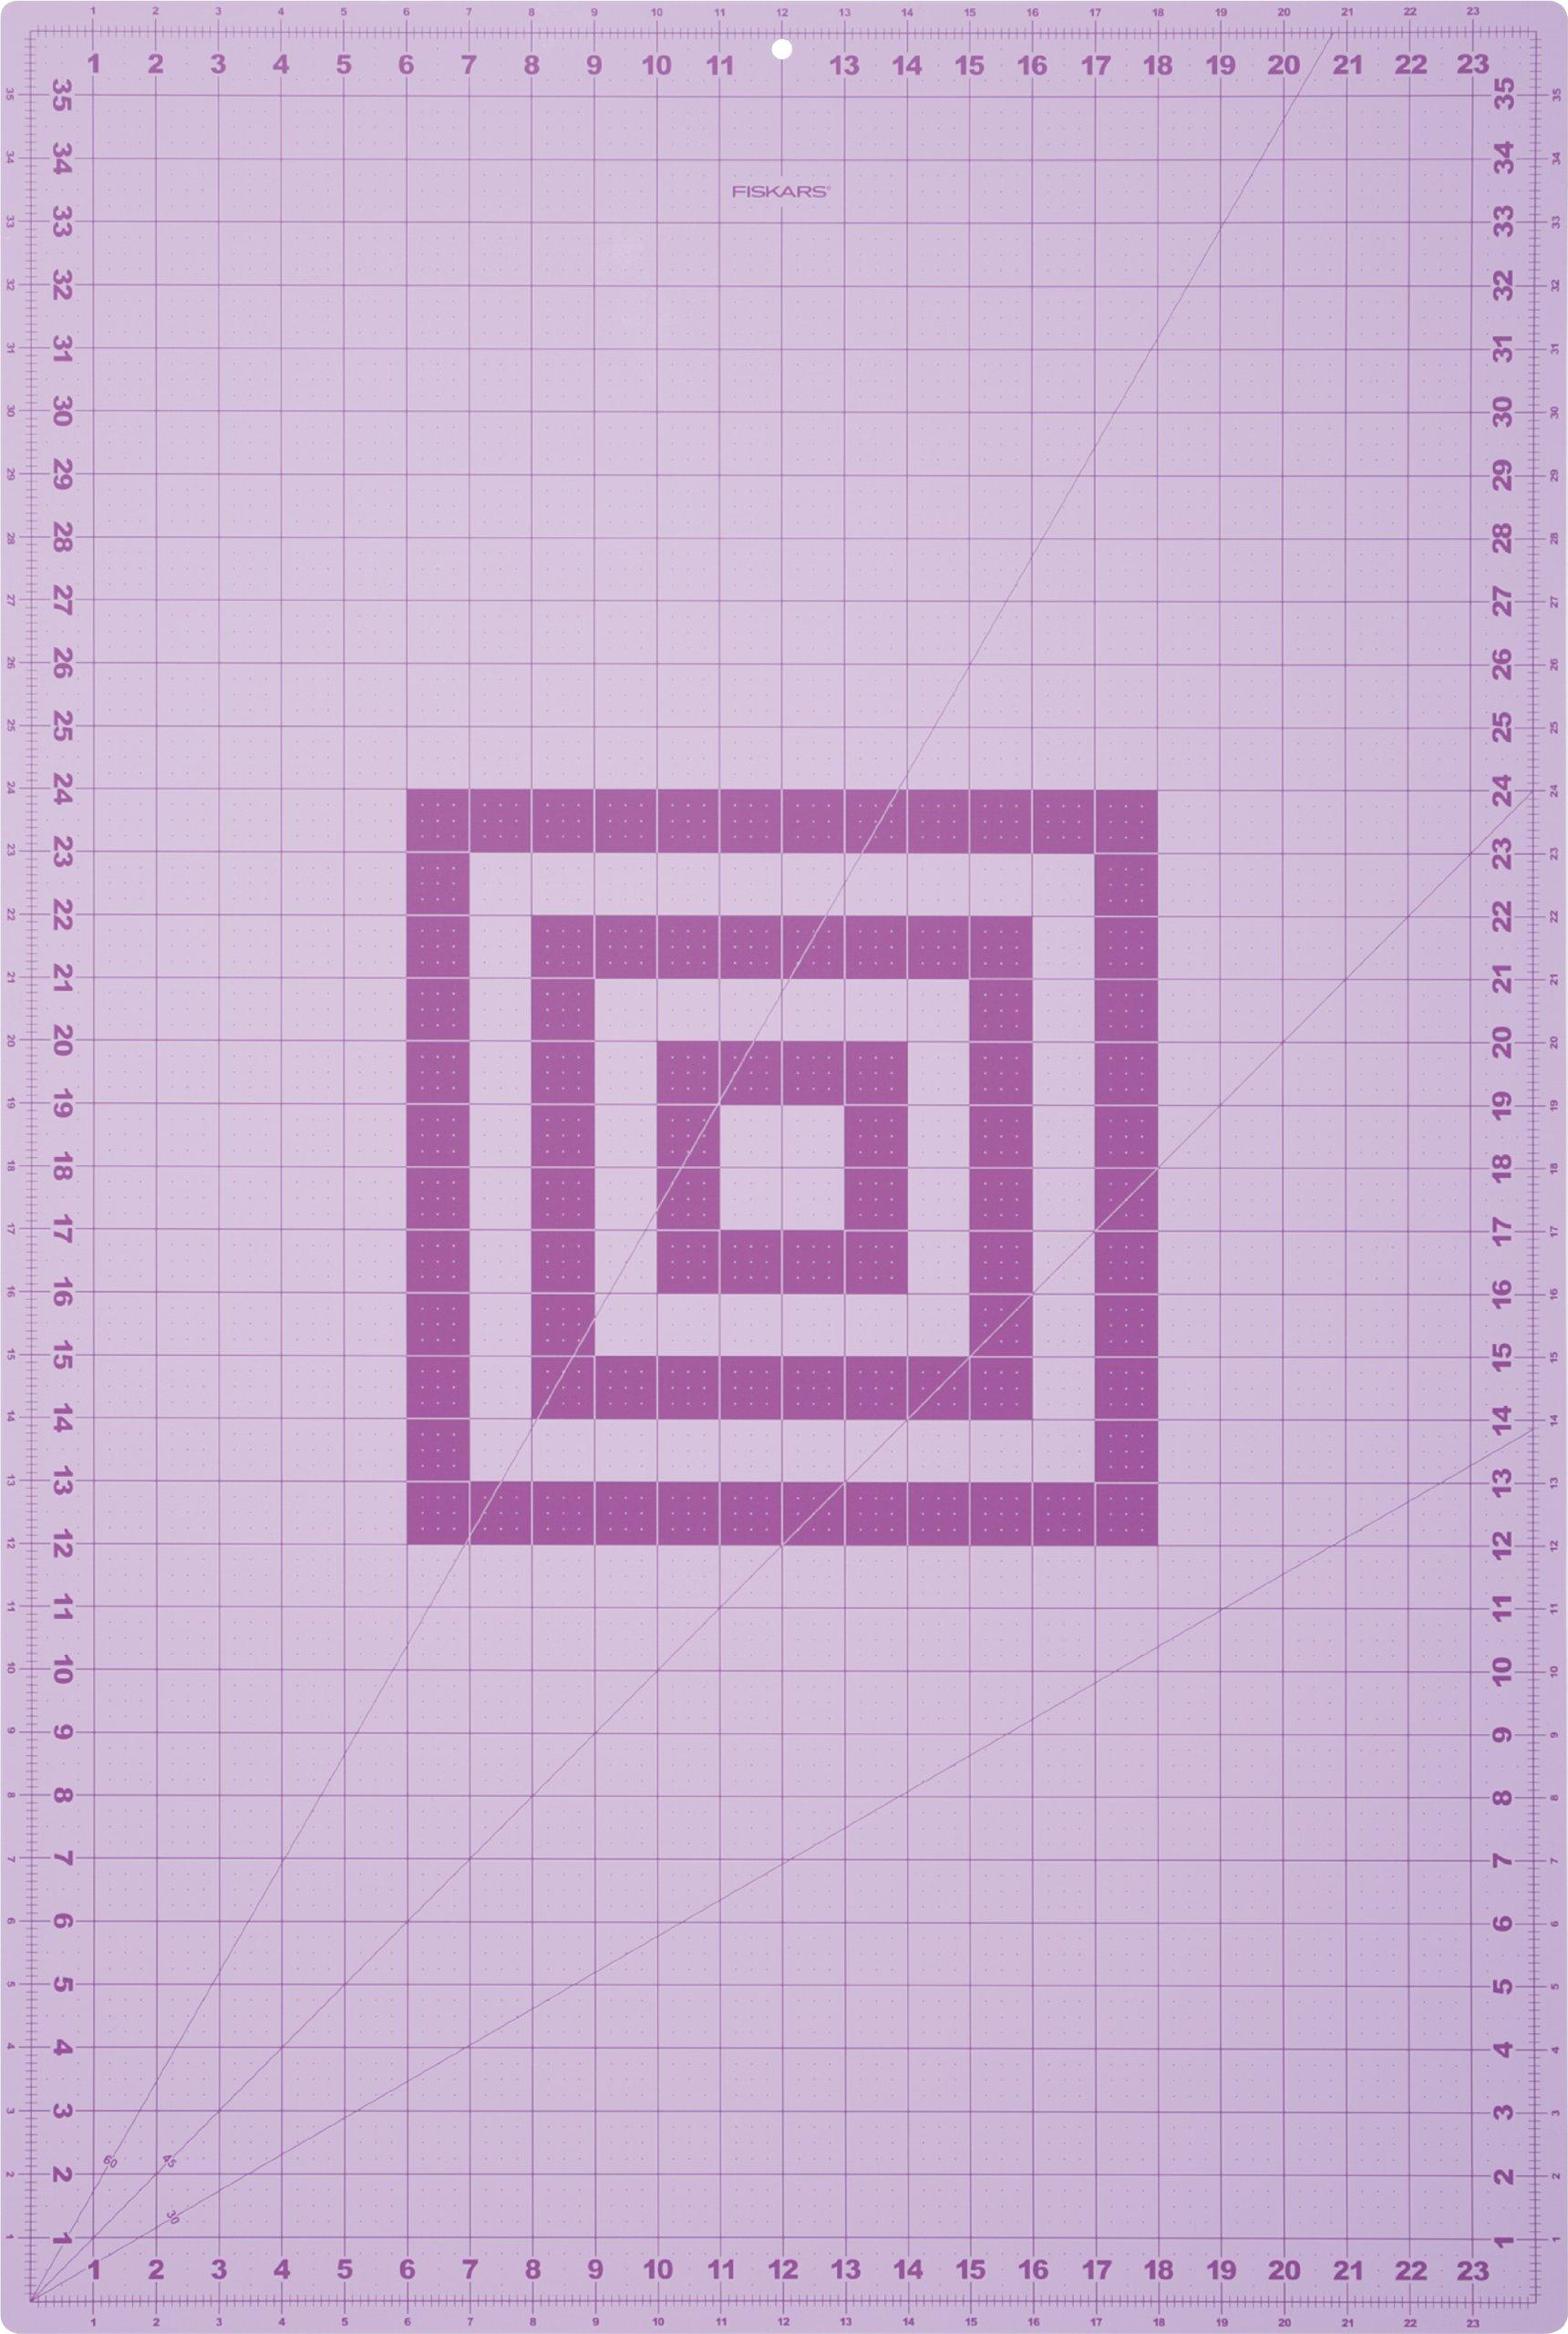 Fiskars 183720-1002 Fashion Cutting Mat, 24 by 36-Inch (Colors may vary) by Fiskars